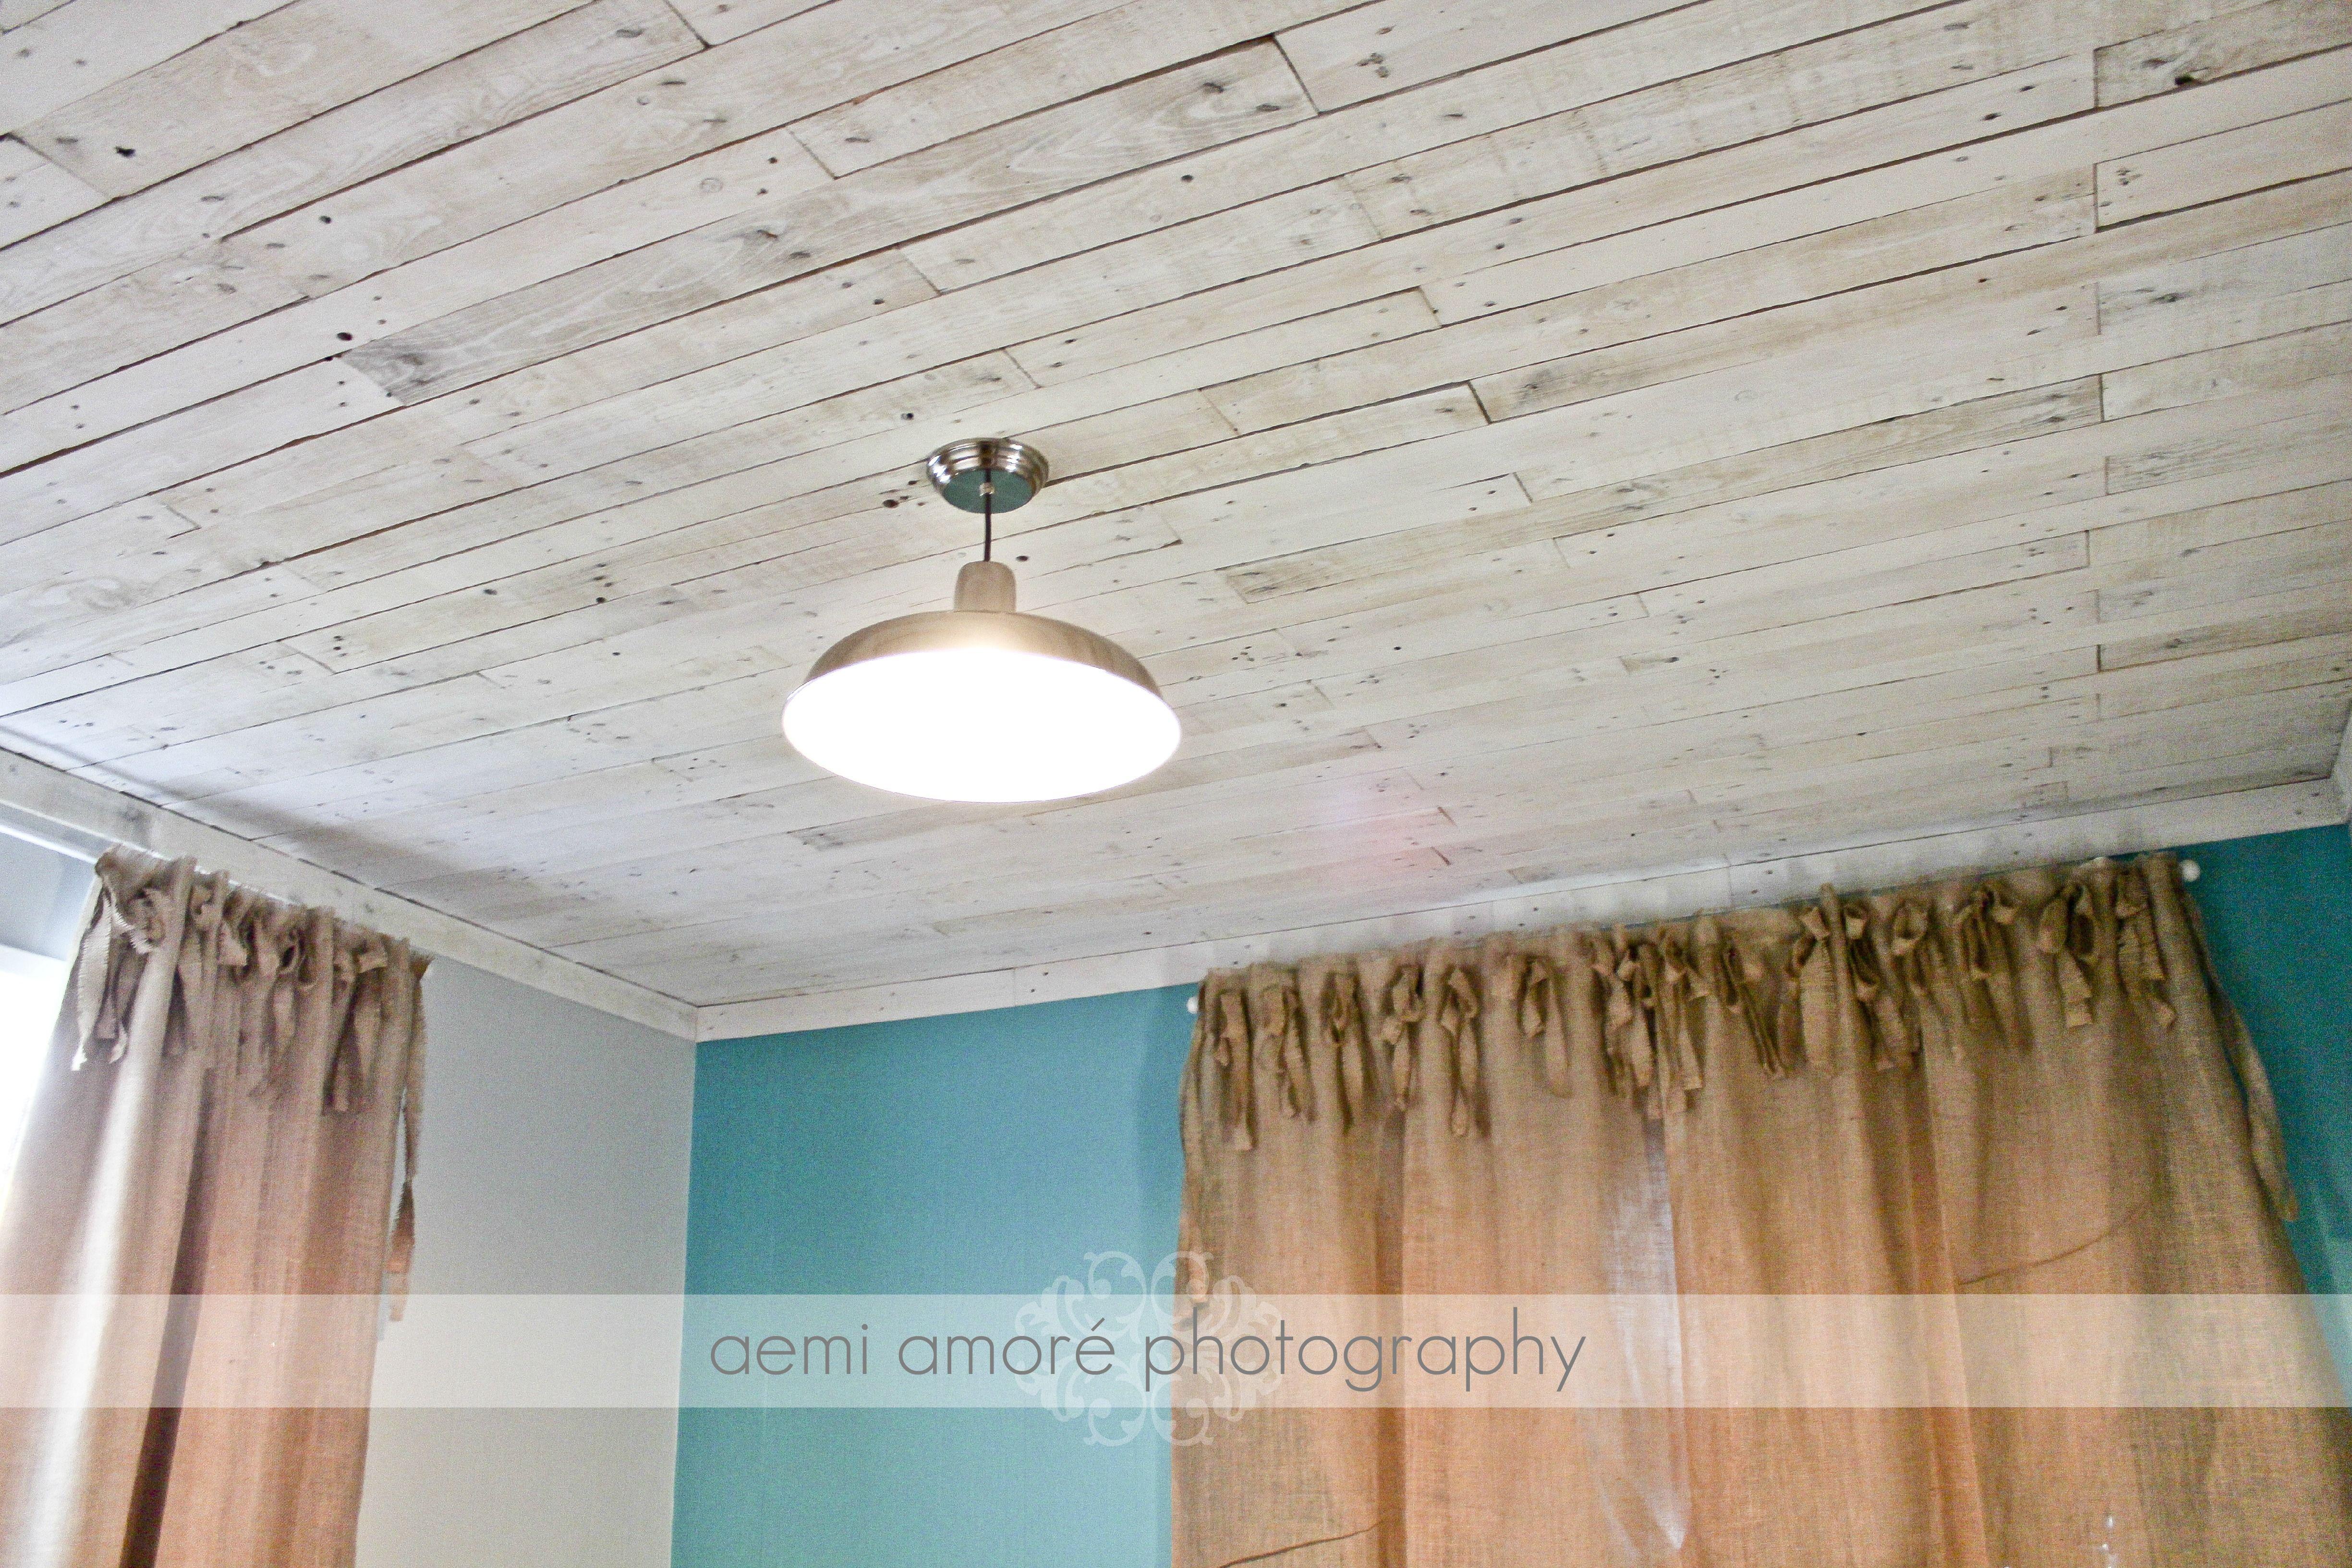 White Washed Ceiling I Made Using Pallet Wood, I Added